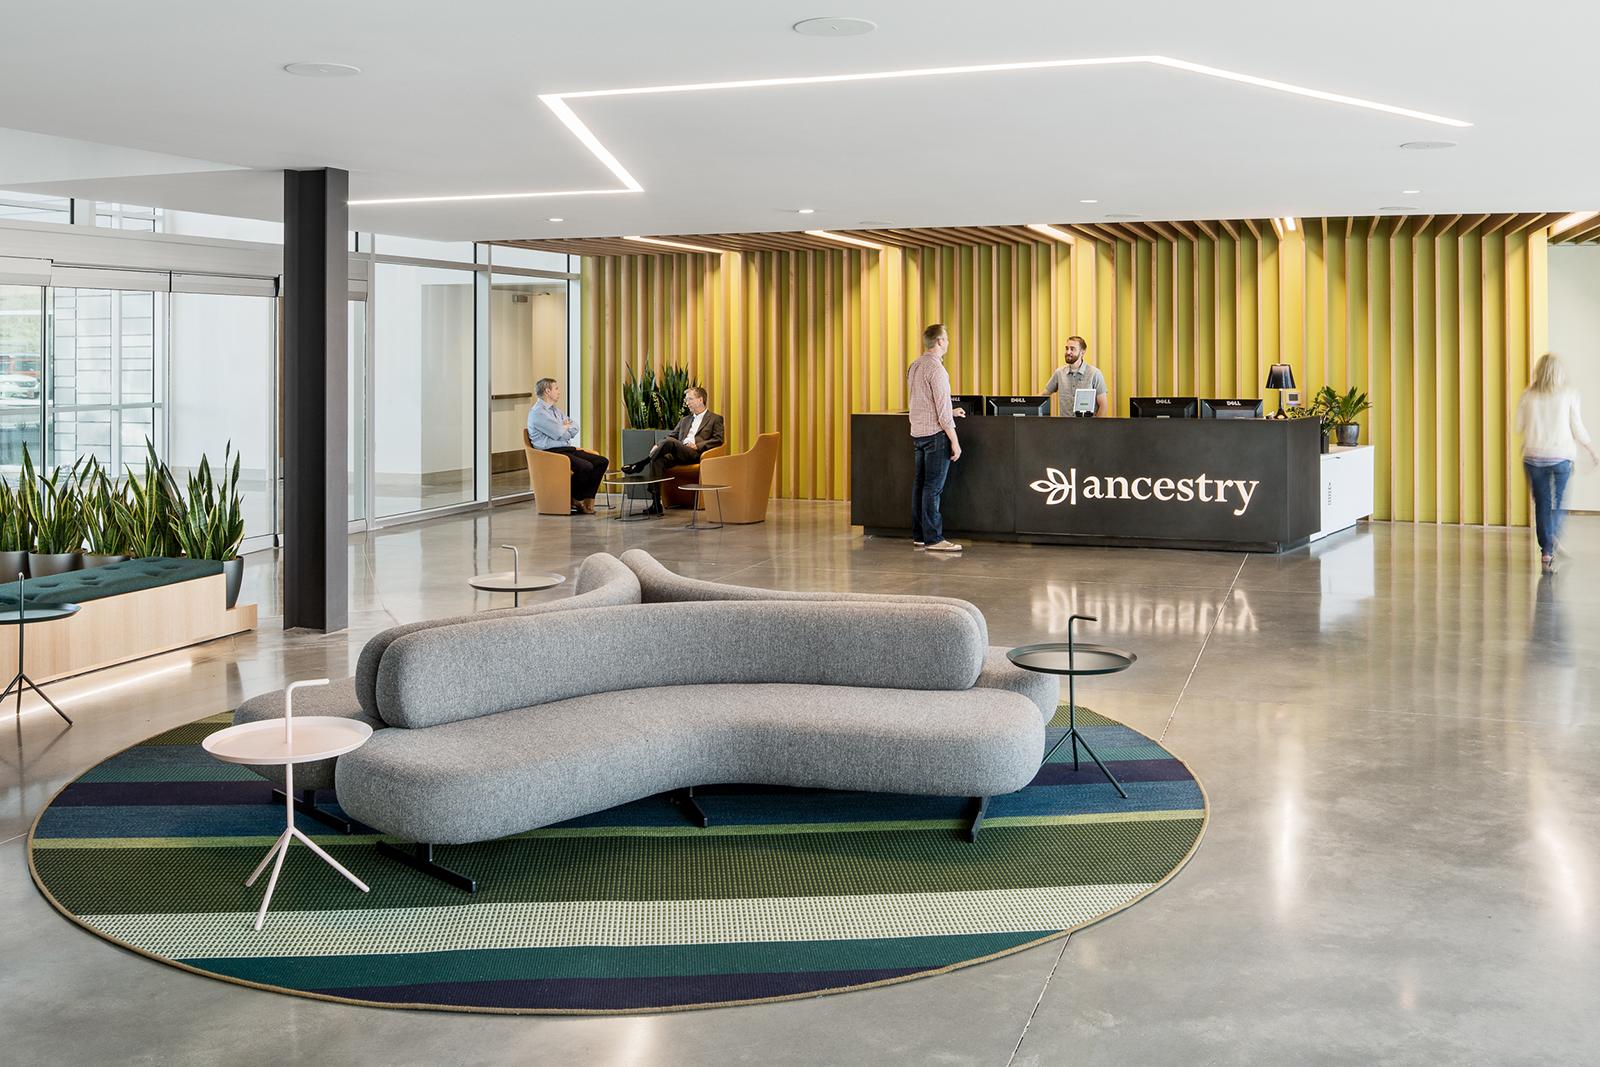 ancestry-salt-lake-city-office-14